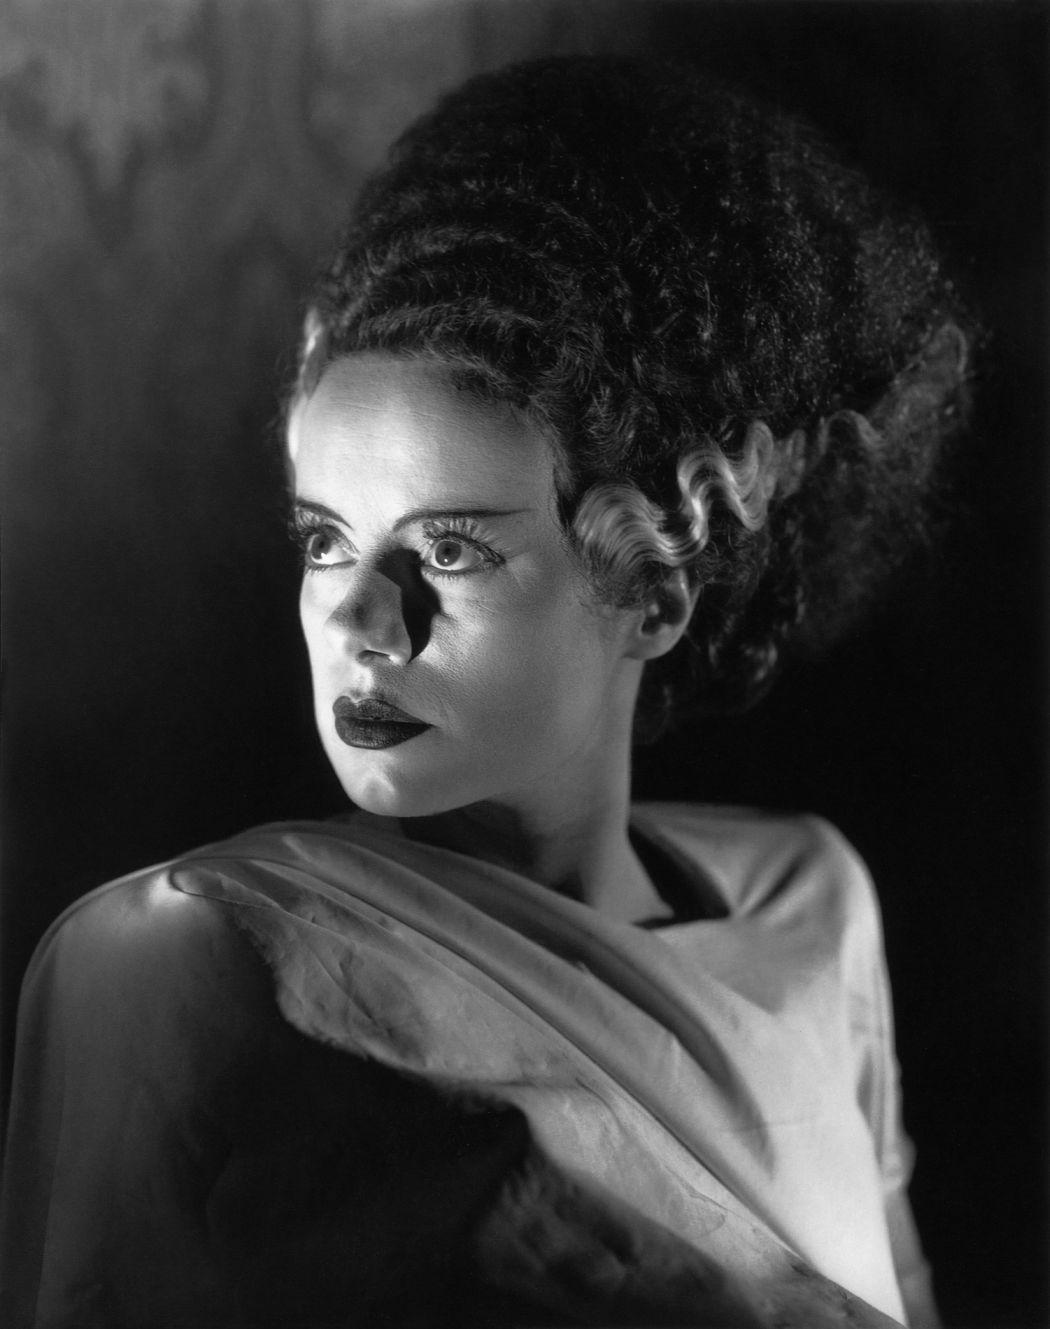 The-Bride-of-Frankenstein-(1935)-24